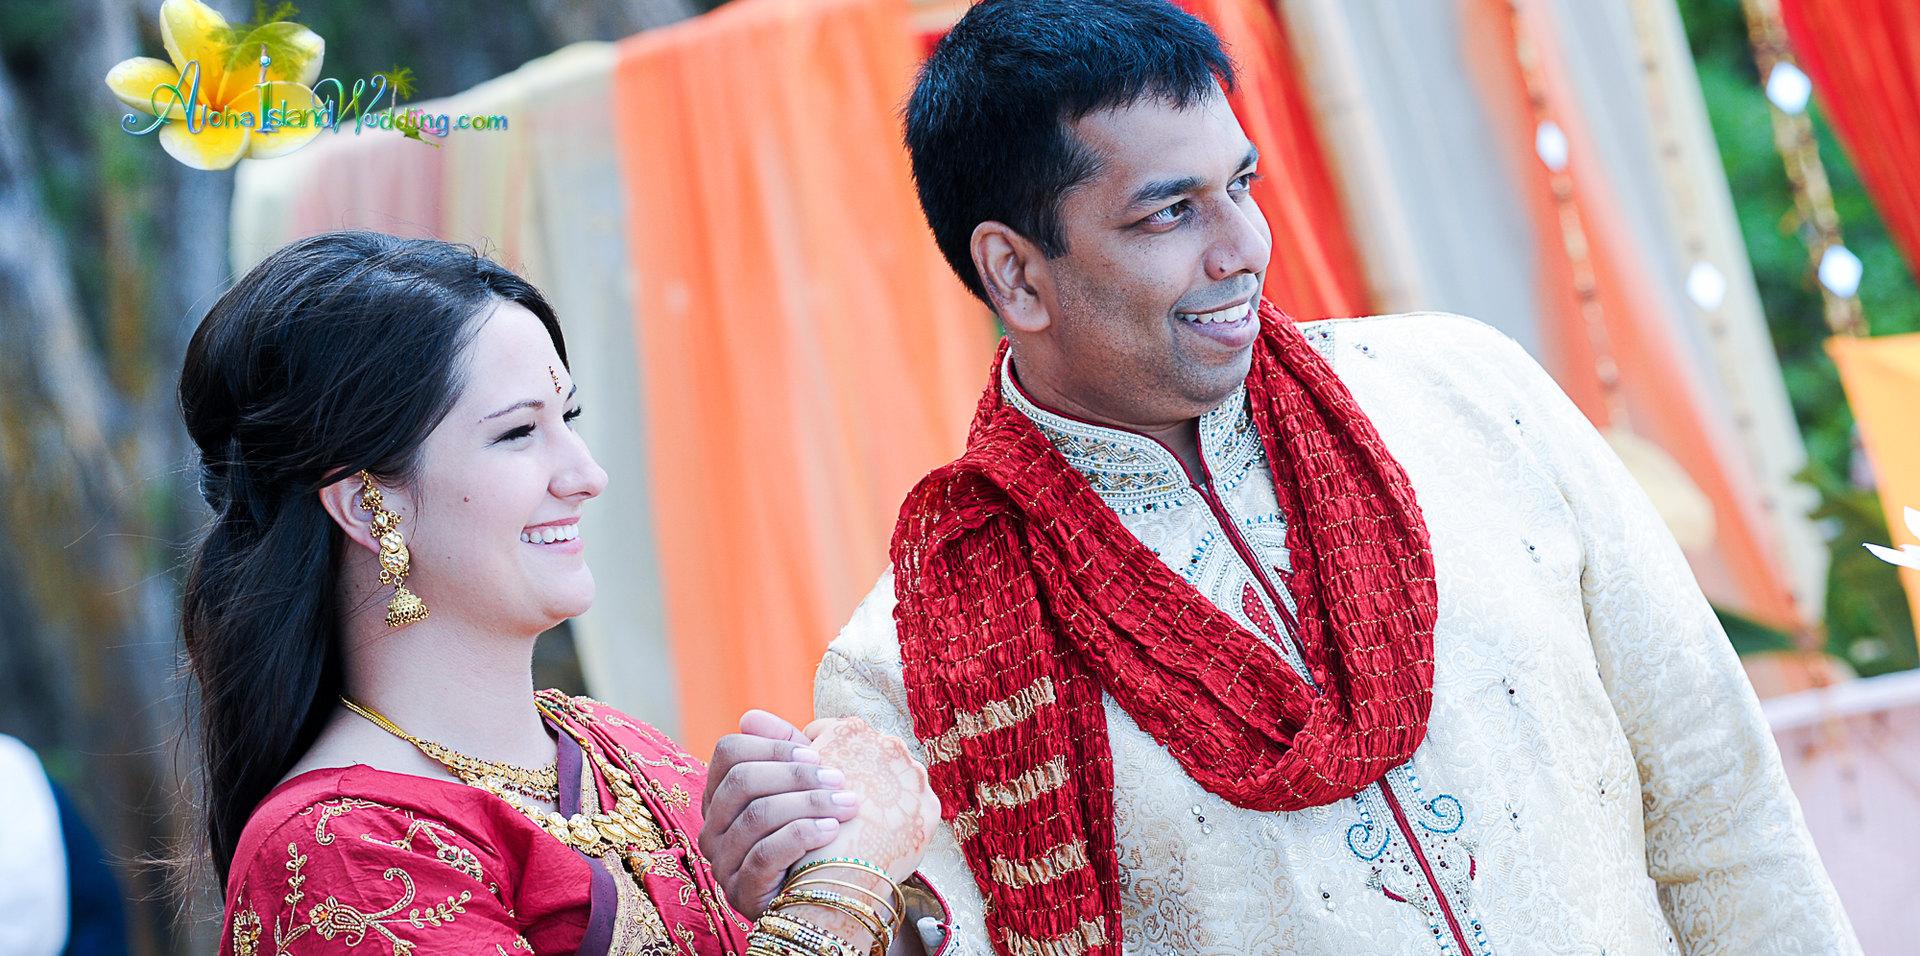 Indian wedding ceremony in hawaii-108.jp